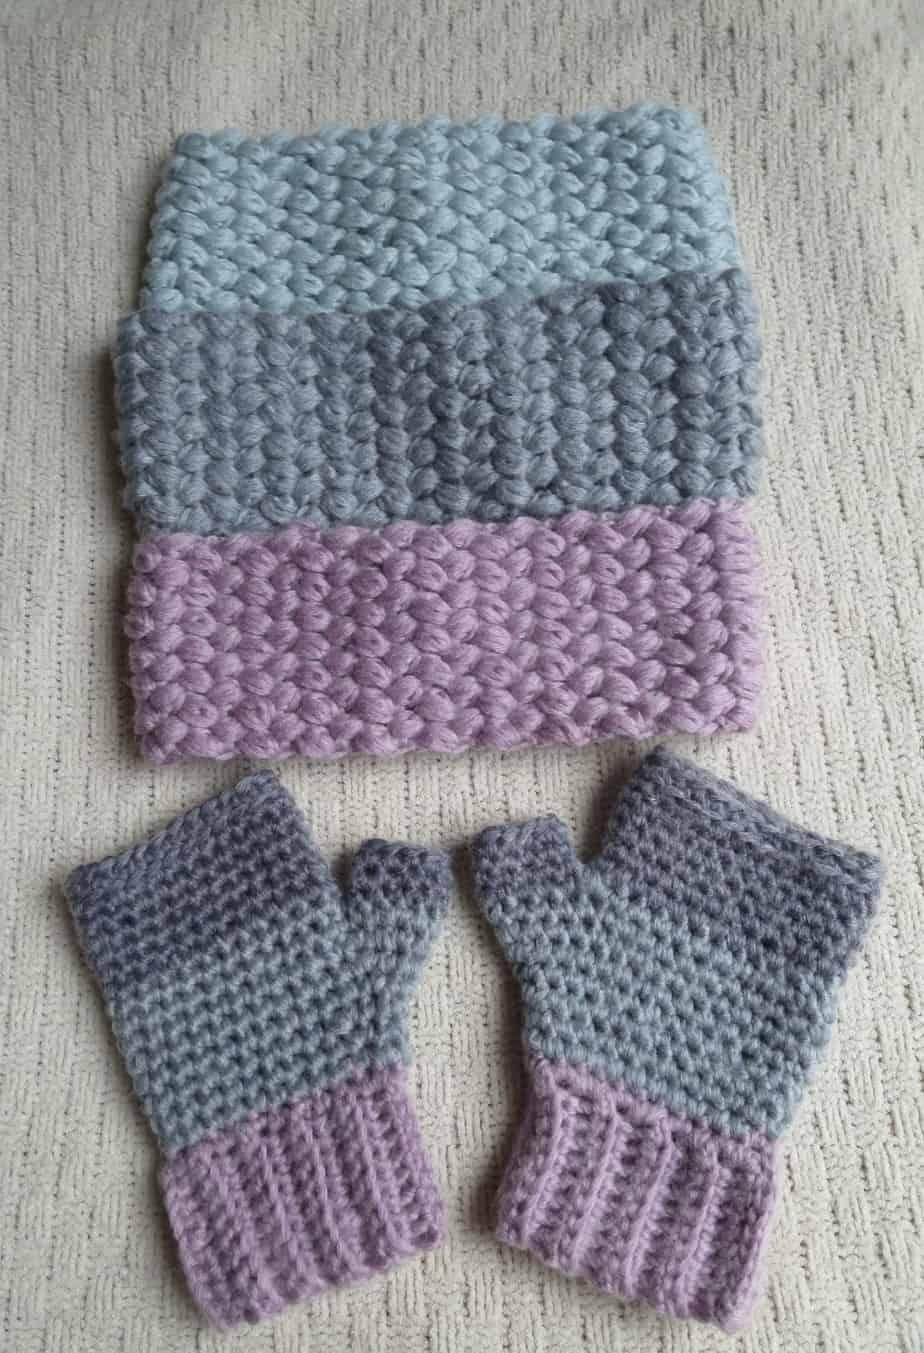 Crochet Fingerless Gloves Free Crochet Pattern Crochet Accessories